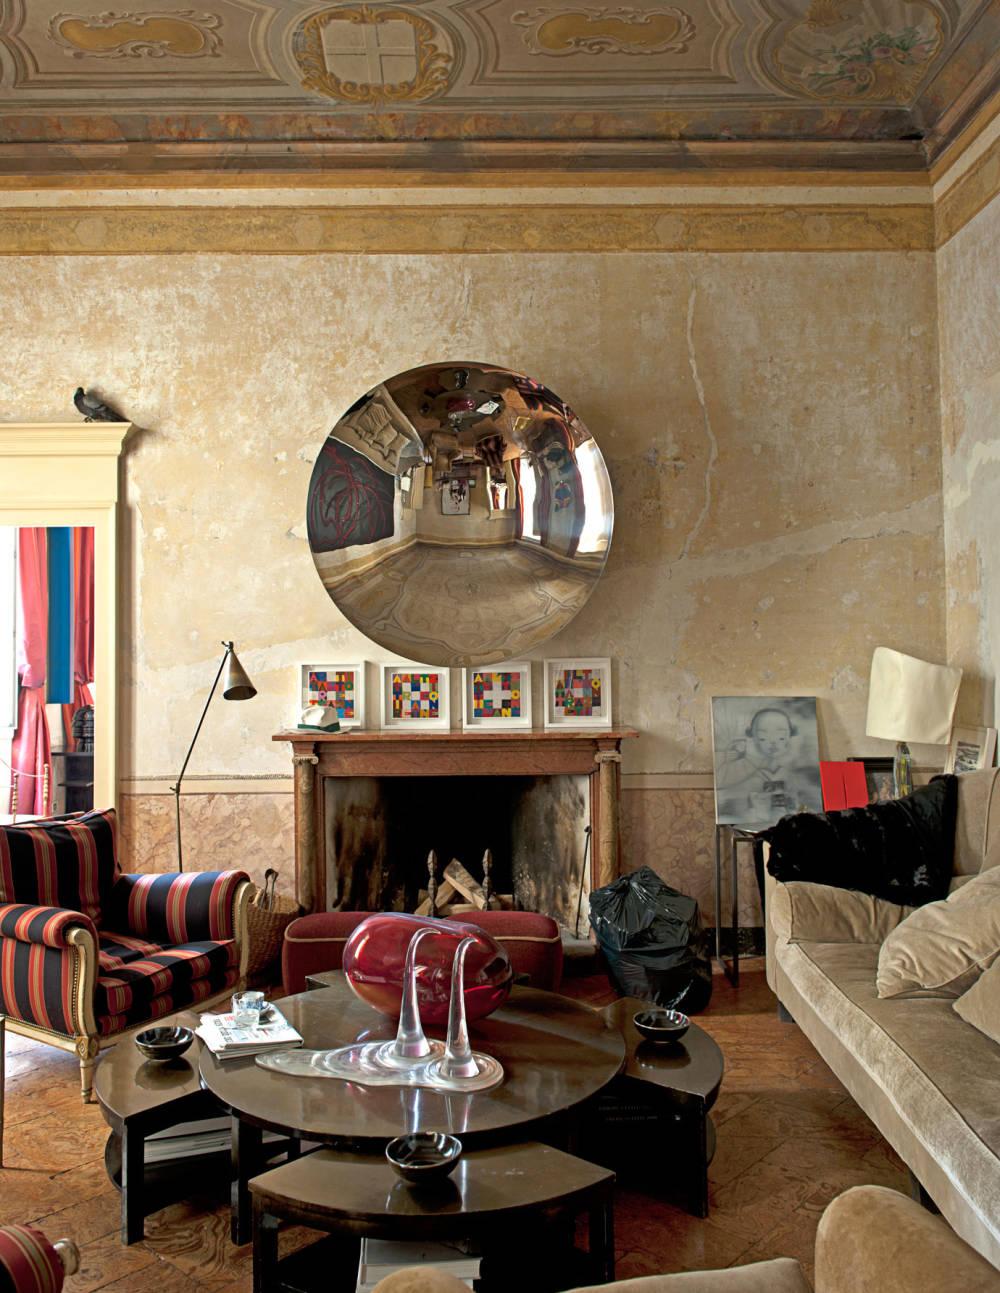 TCX-09-anish-kapoor-sculpture-living-room-1111-xl-mv